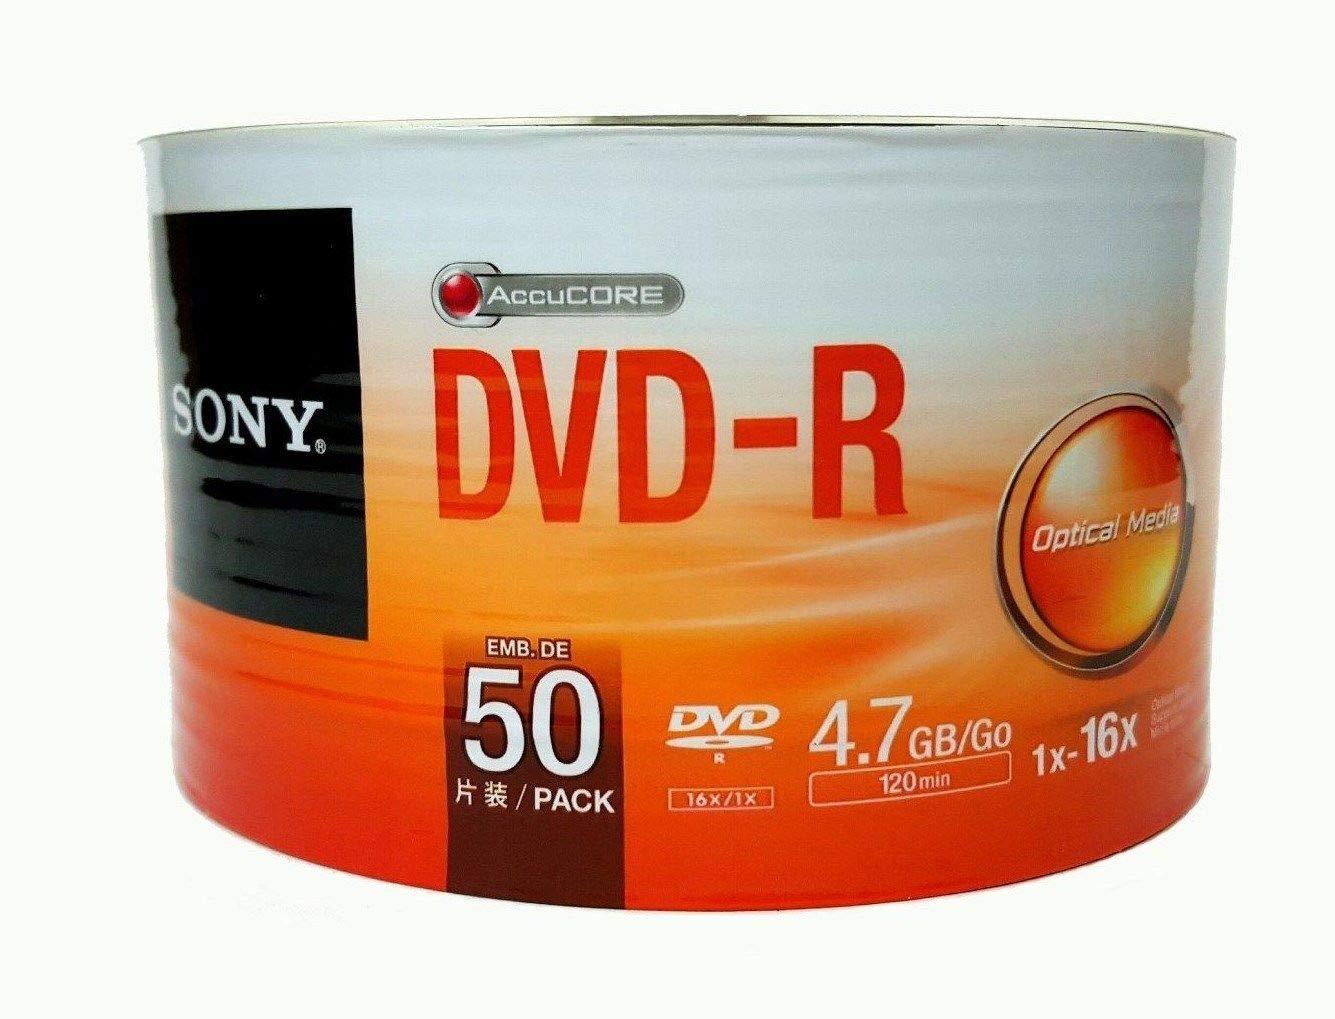 Sony DVD-R 16x, 50 - DVD+RW vírgenes (50, 4,7 GB, DVD-R, 120 min, Eje): Sony: Amazon.es: Informática